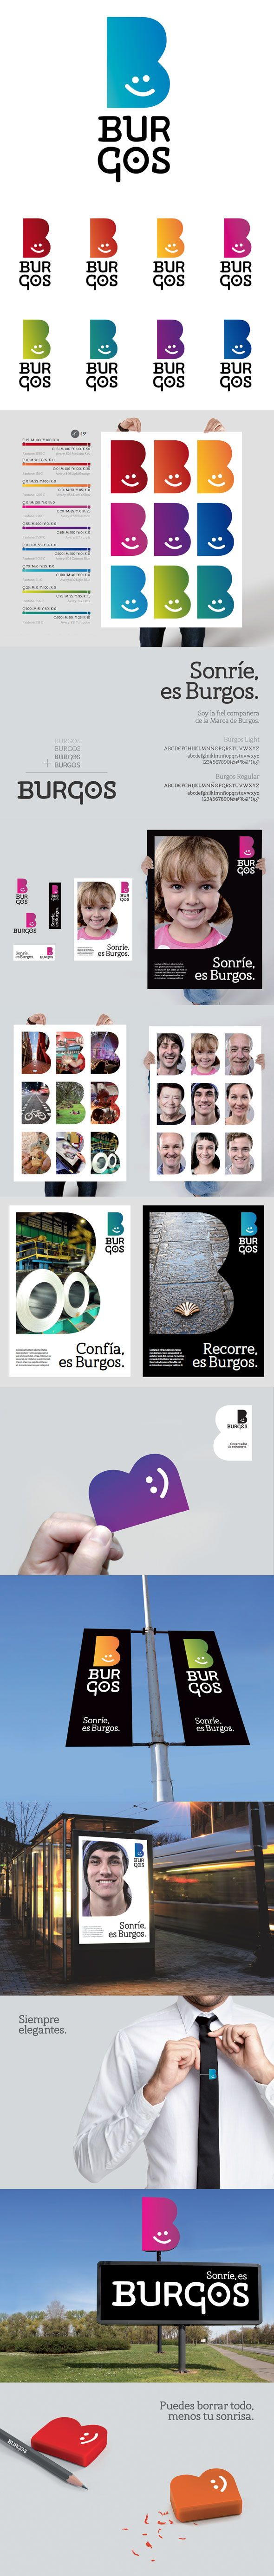 Identity for Burgos, Spain, city brand 2012, Via moirestudiosjkt a thriving website and graphic design studio.